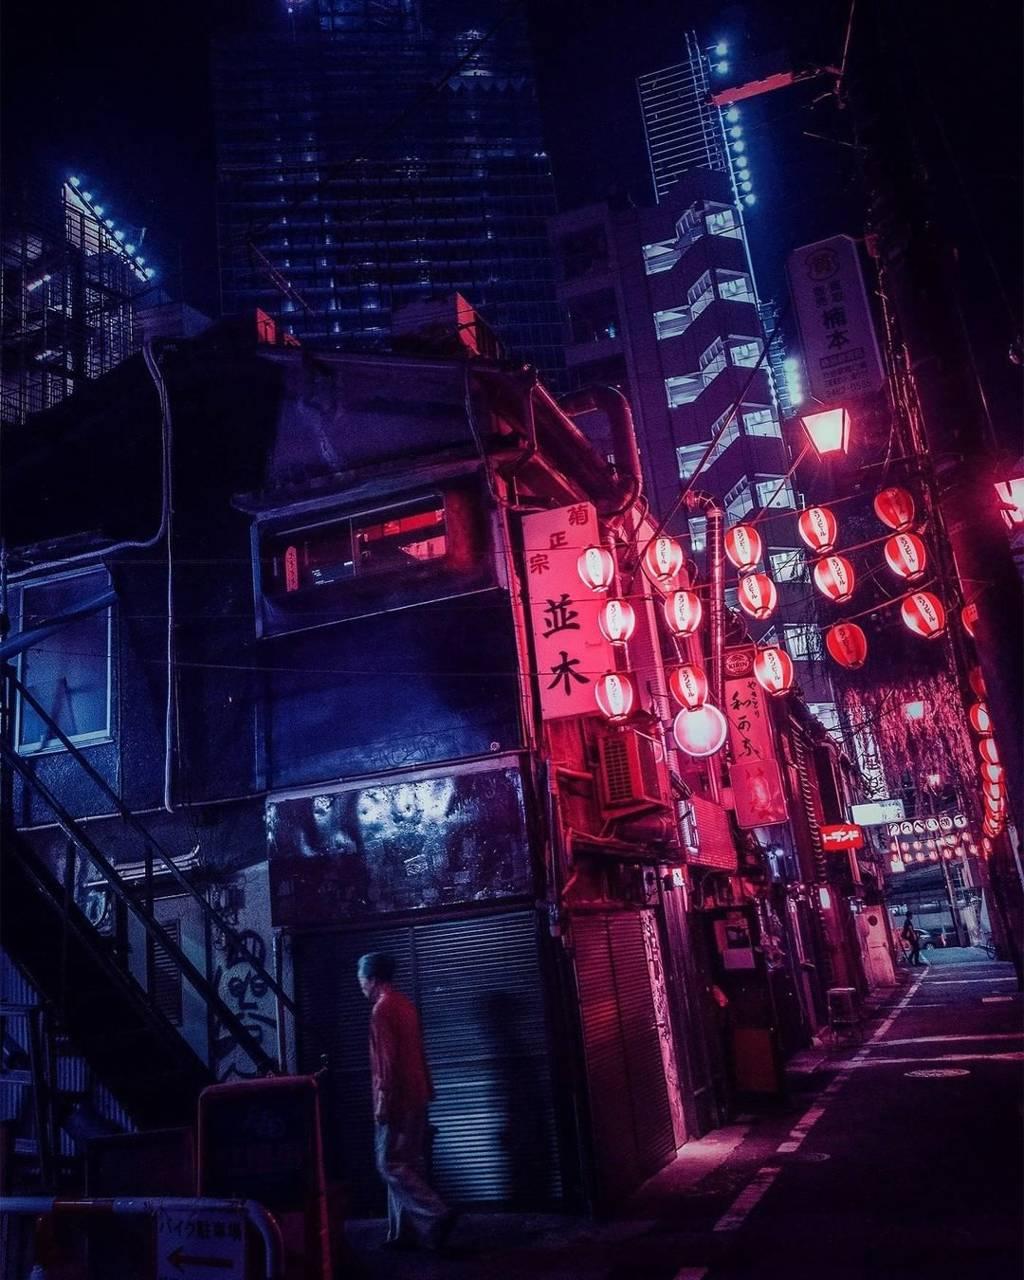 Neon Tokyo night wallpaper by ...